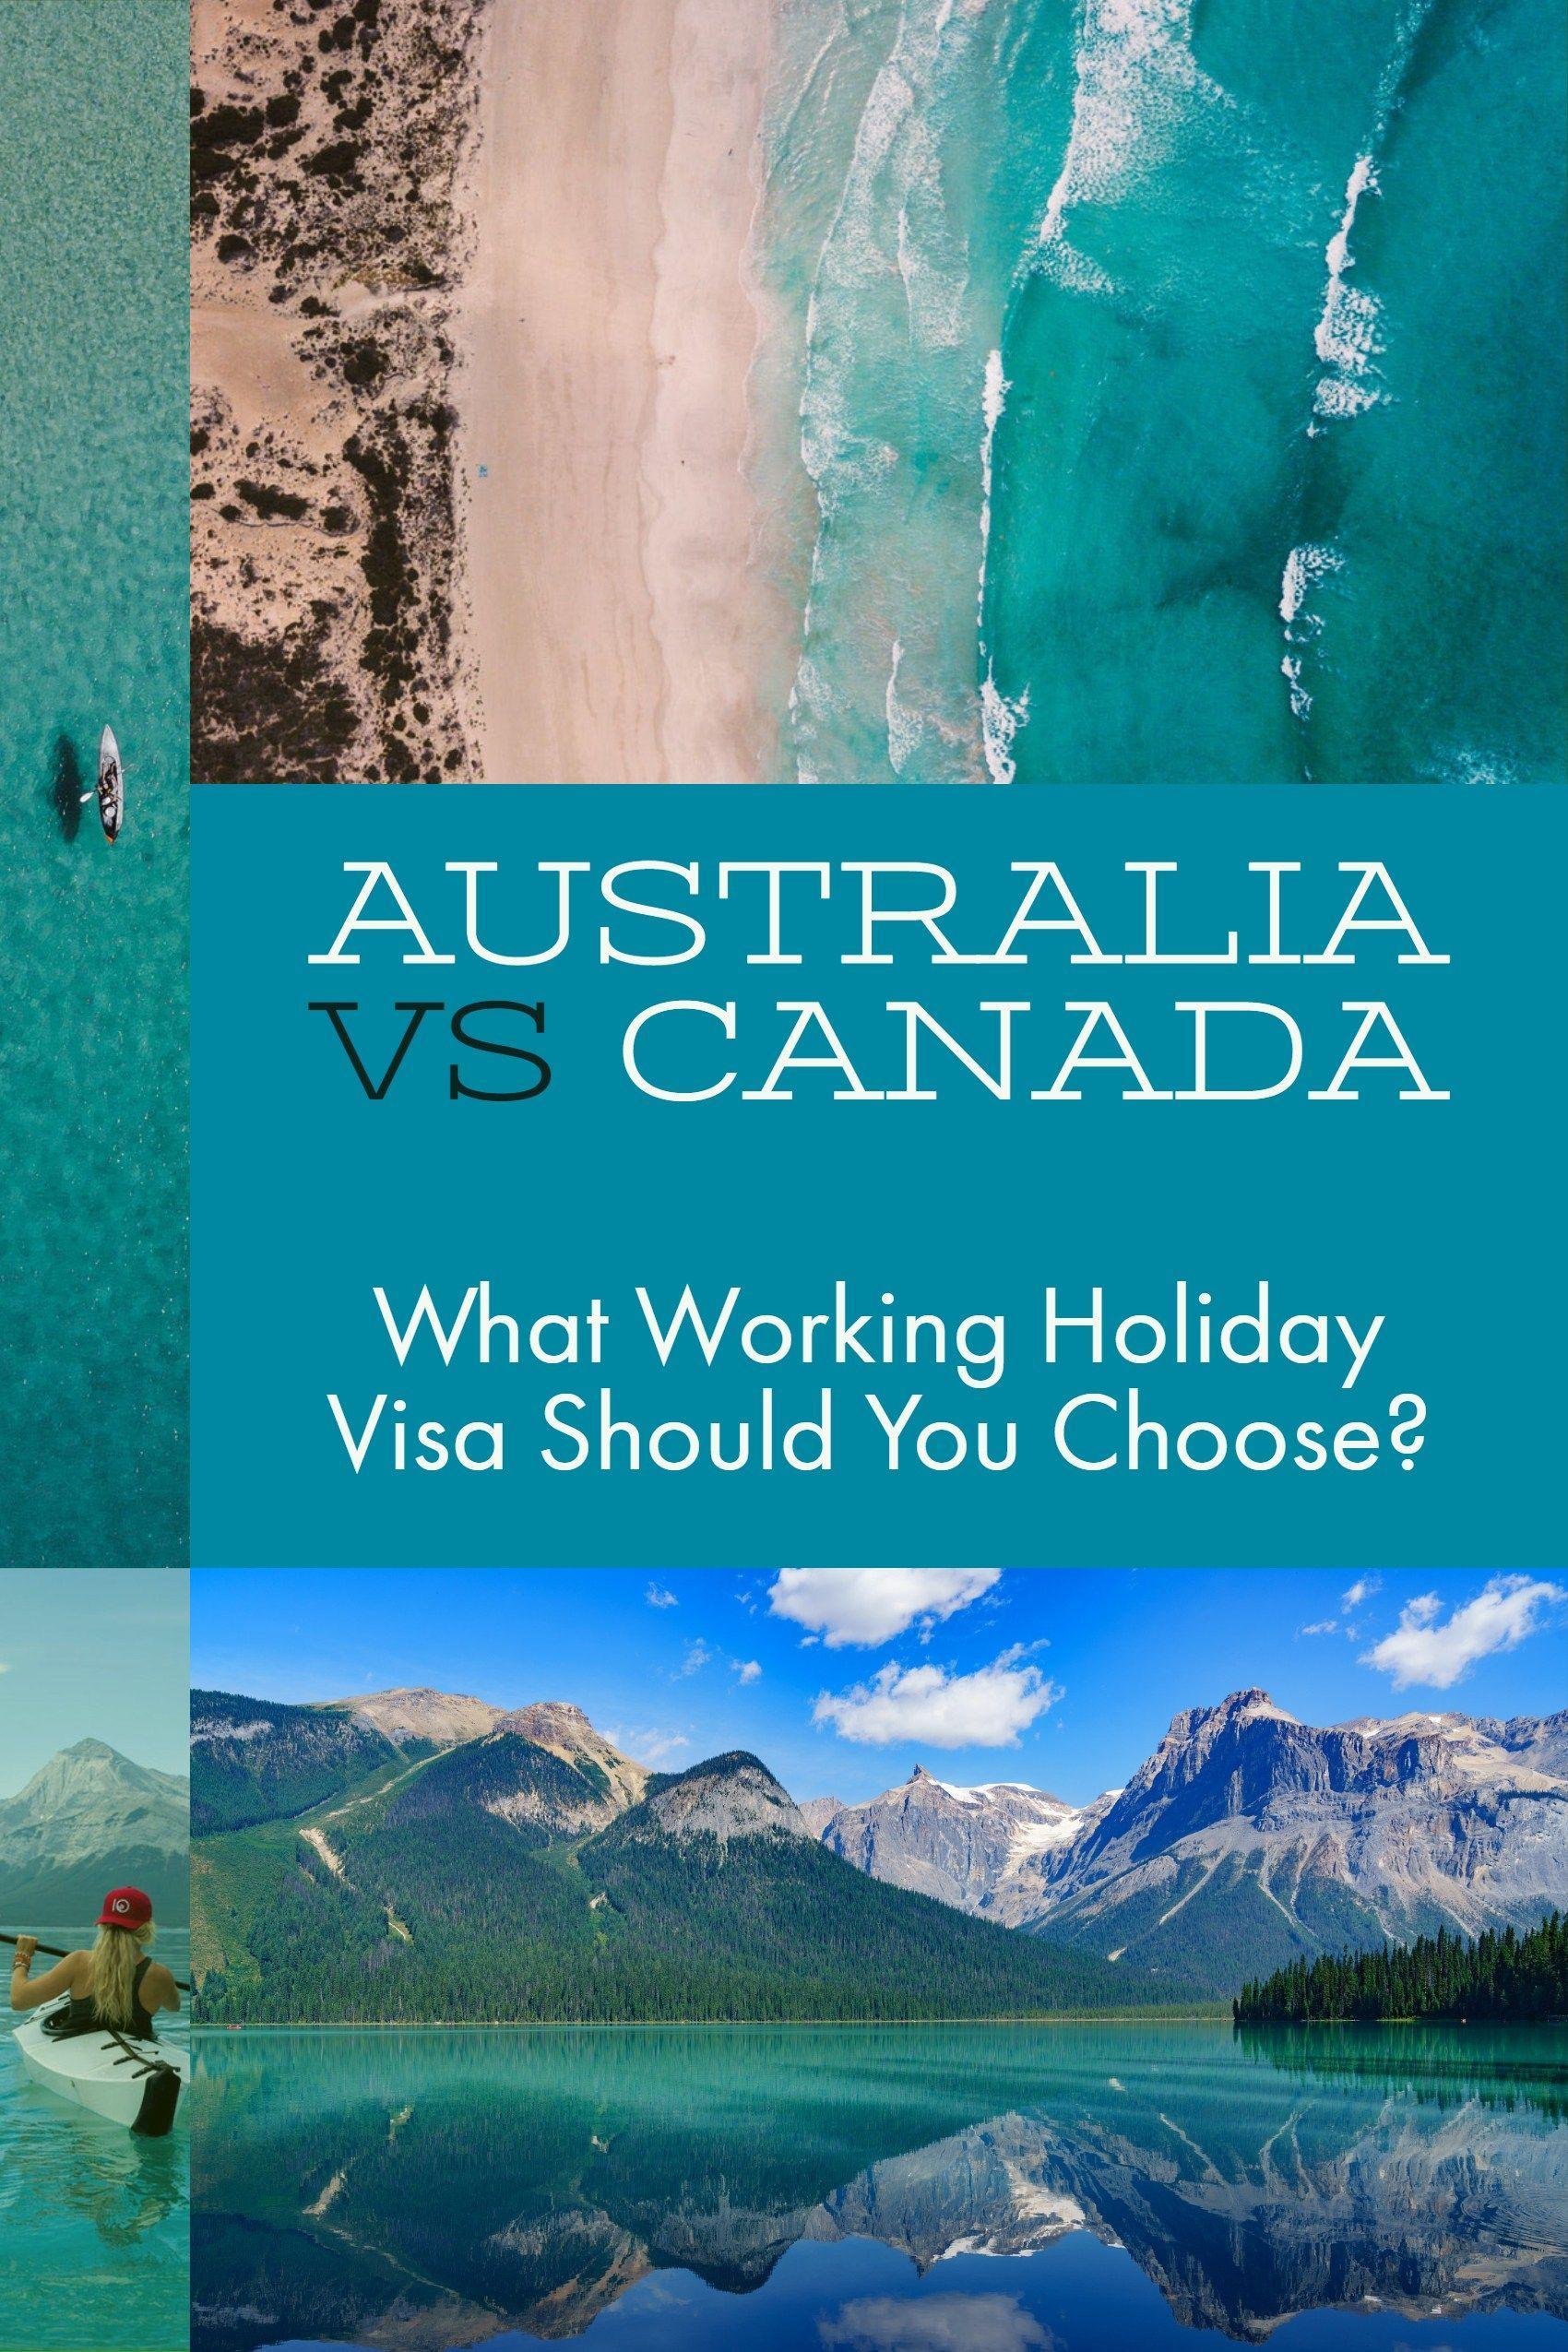 Australia vs canada working holiday visa sportscars